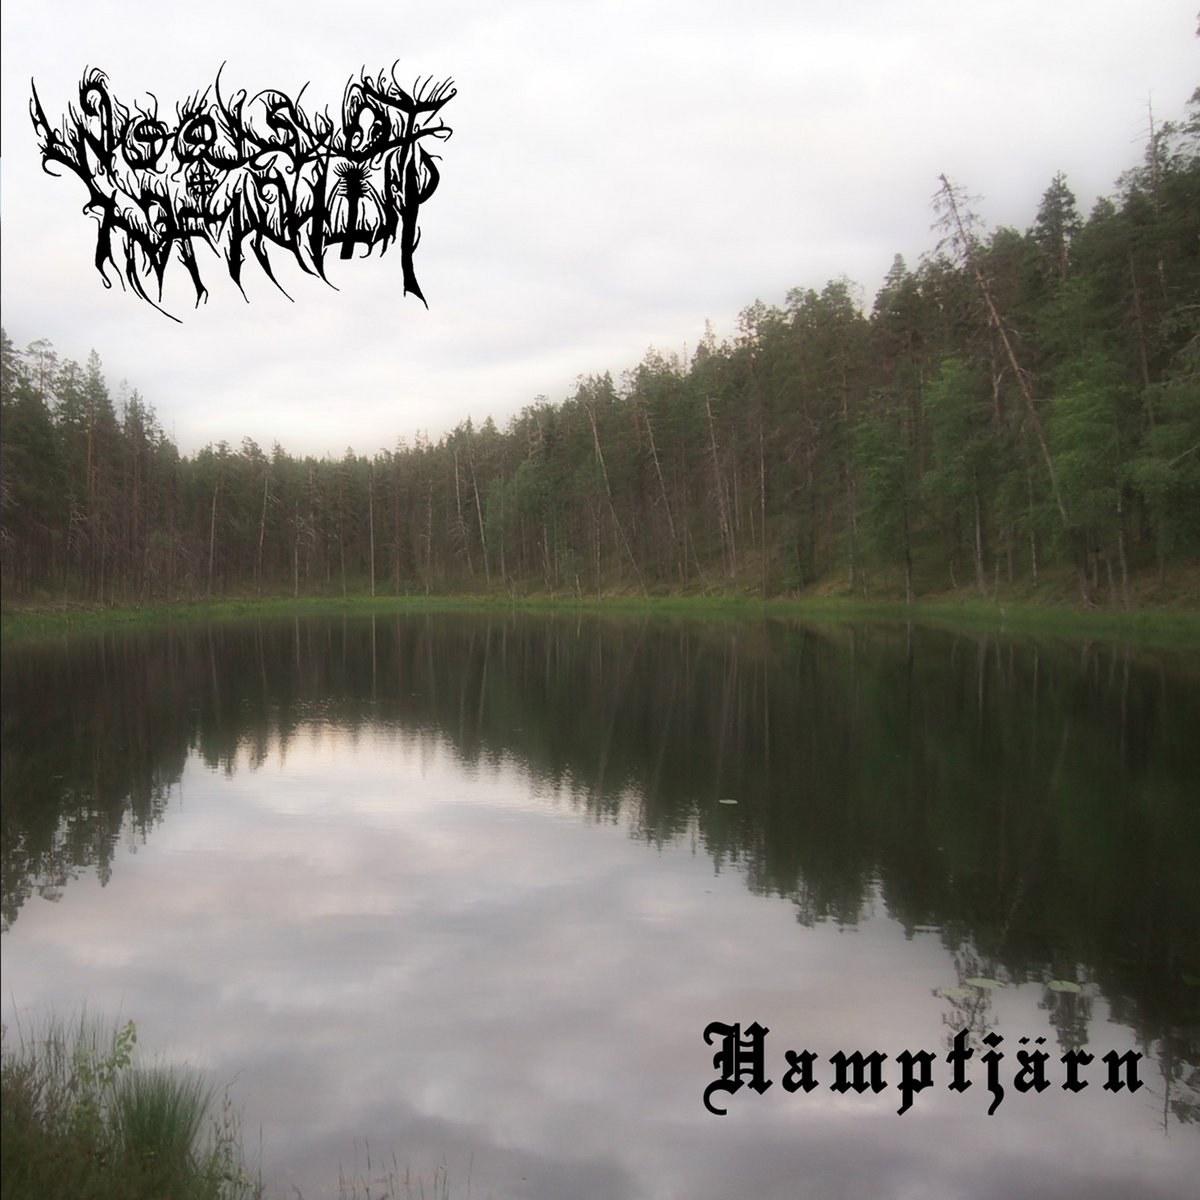 Reviews for Woods of Infinity - Hamptjärn